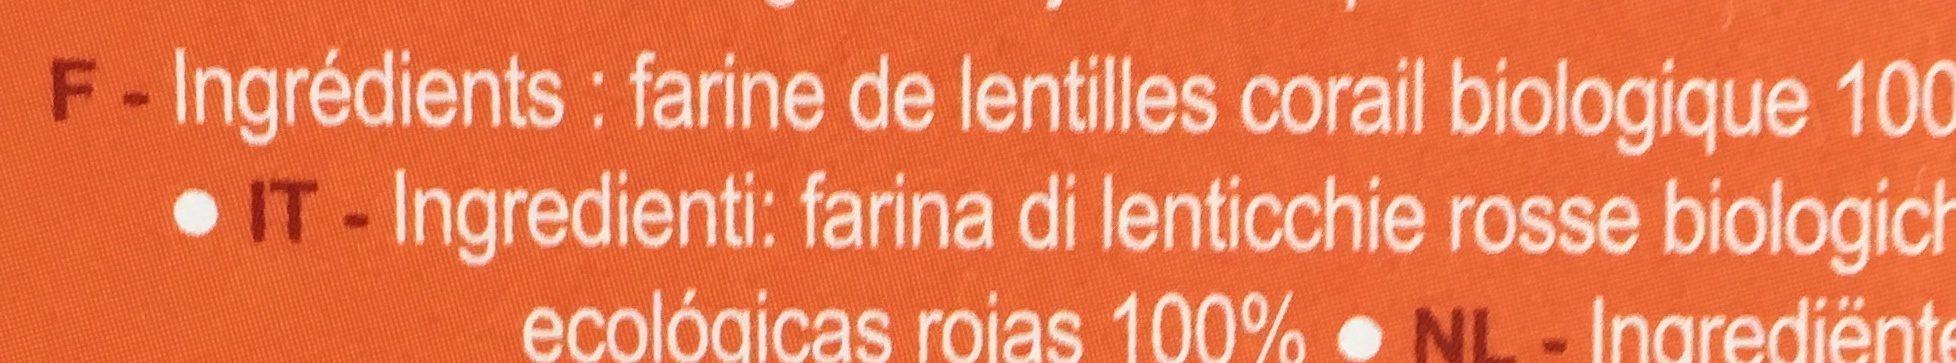 Penne de lentilles corail - Ingrediënten - fr